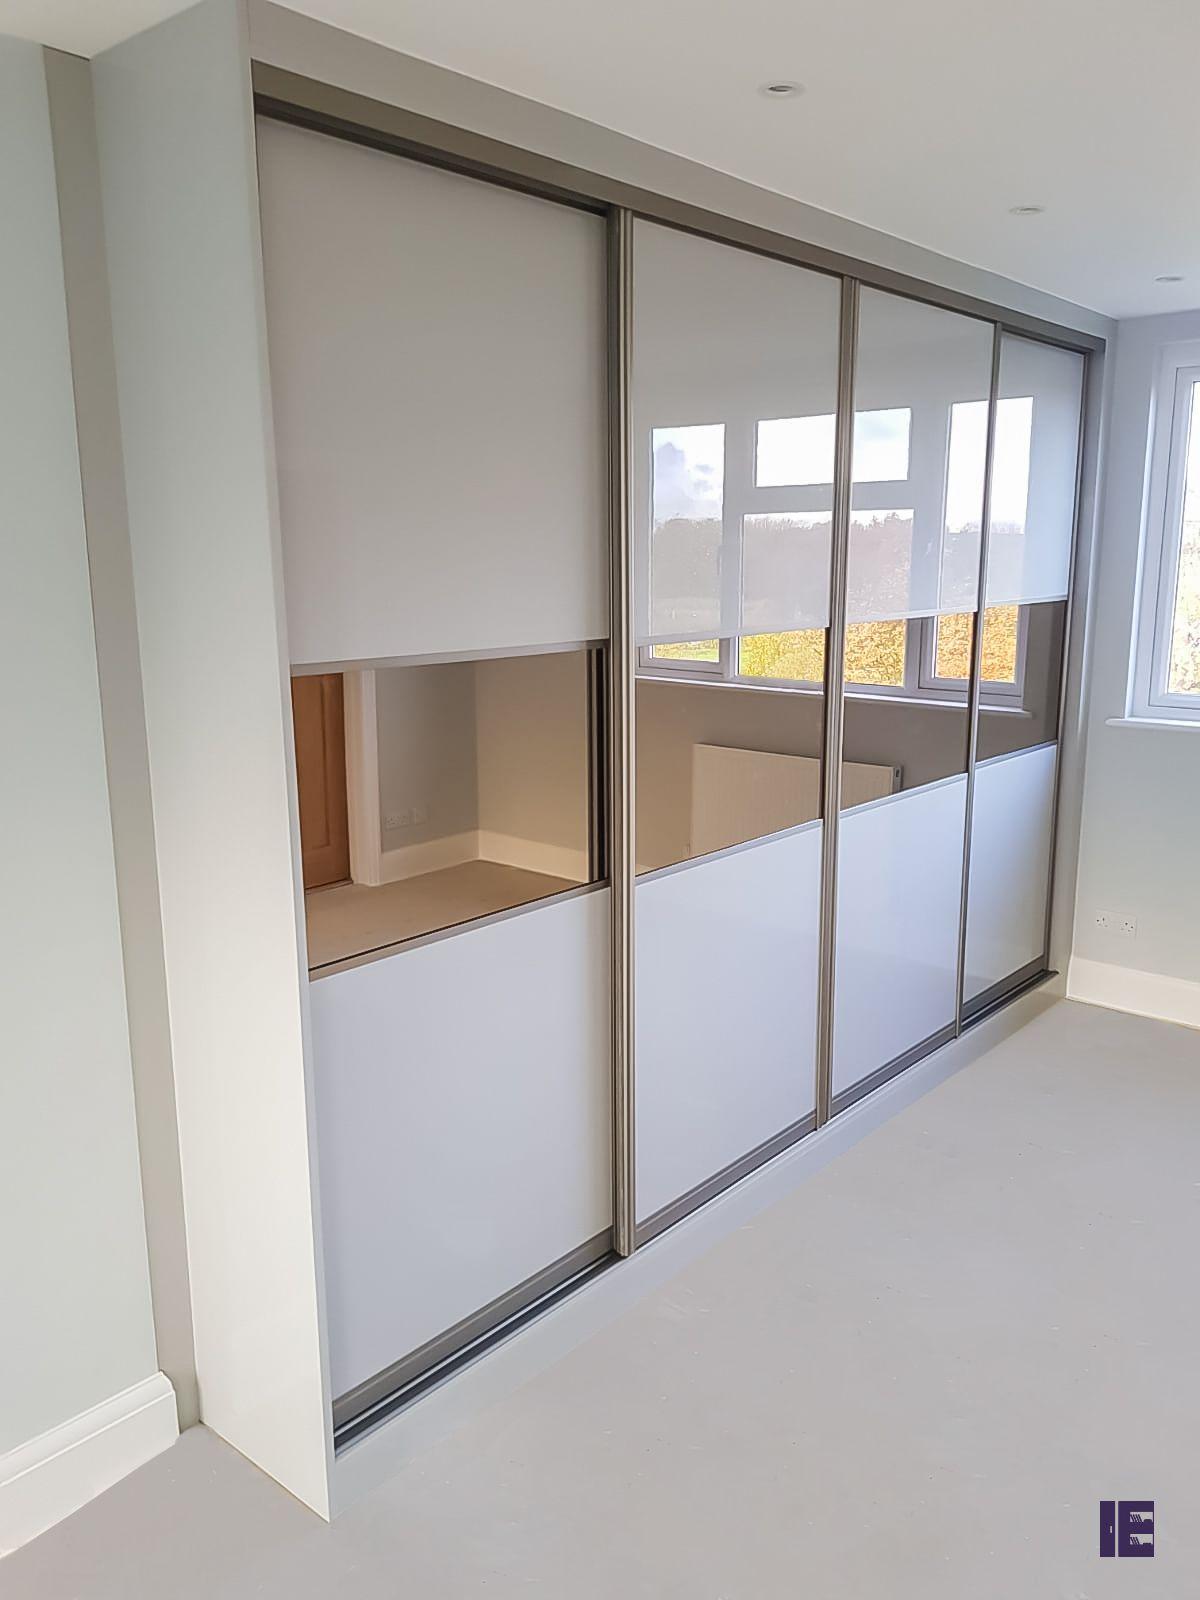 Sliding Door Wardrobes | Fitted Wardrobes Sliding Doors London